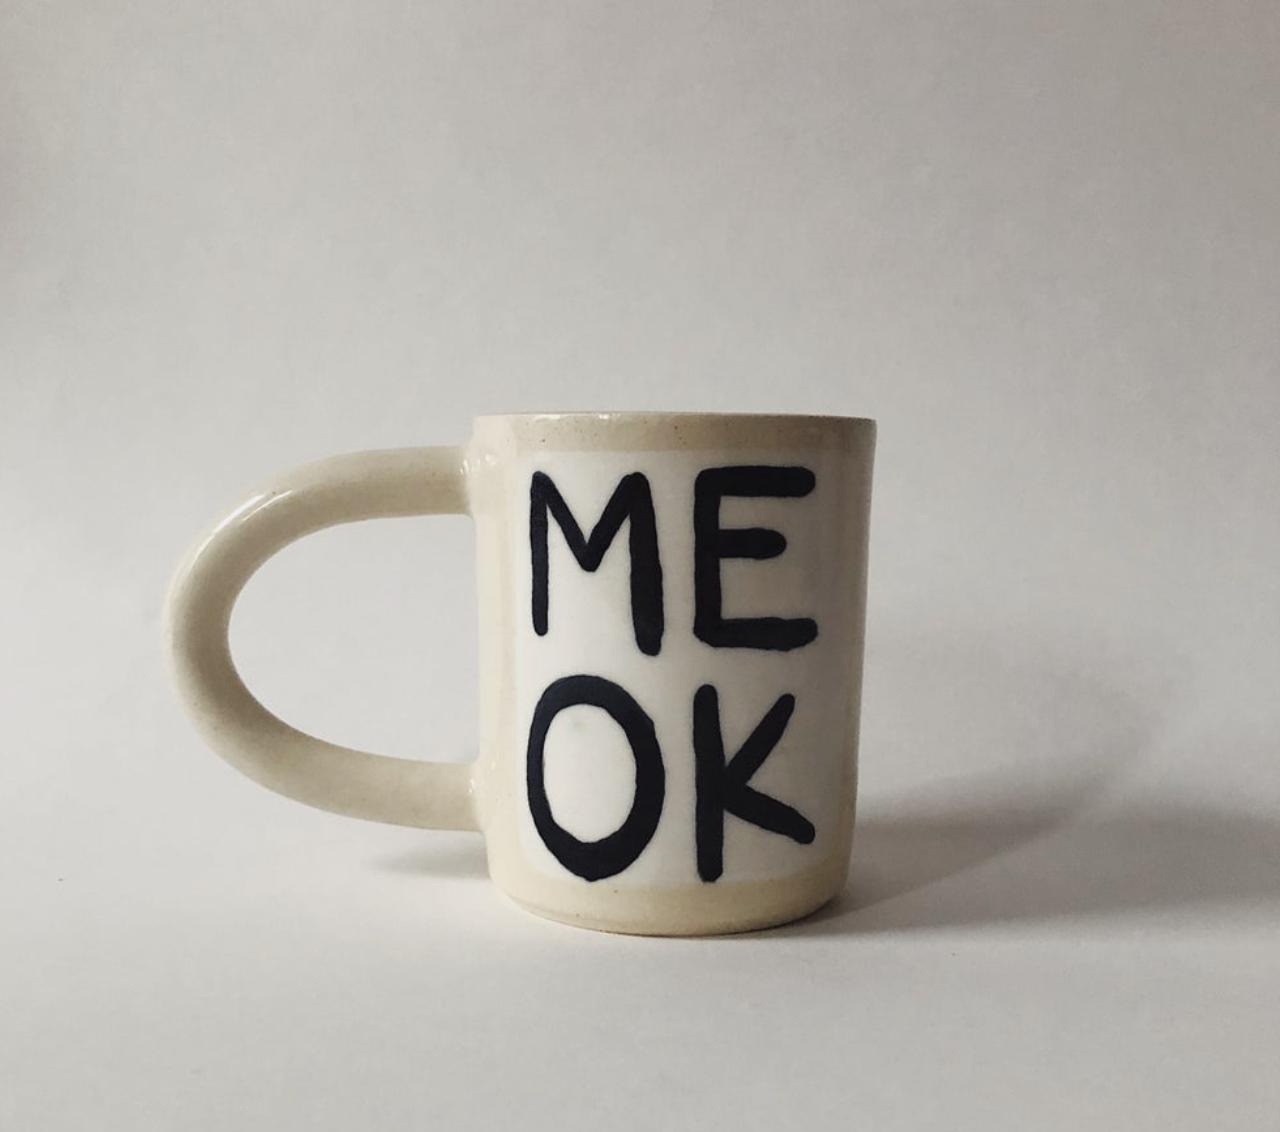 Marion Bull mug